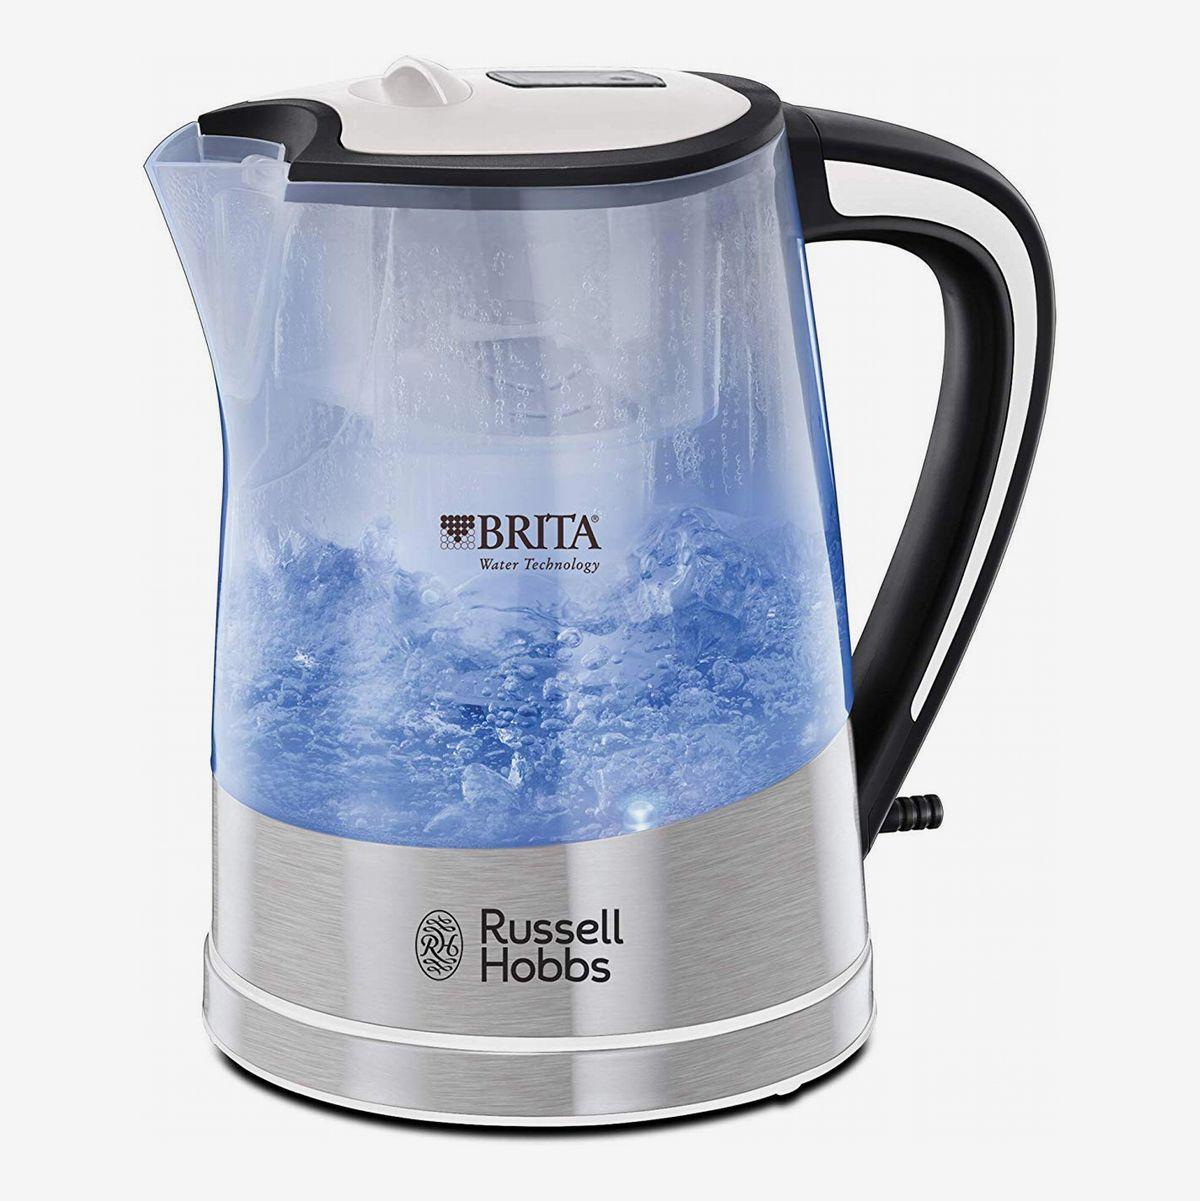 Sale Russell Hobbs Brita Kettle   The